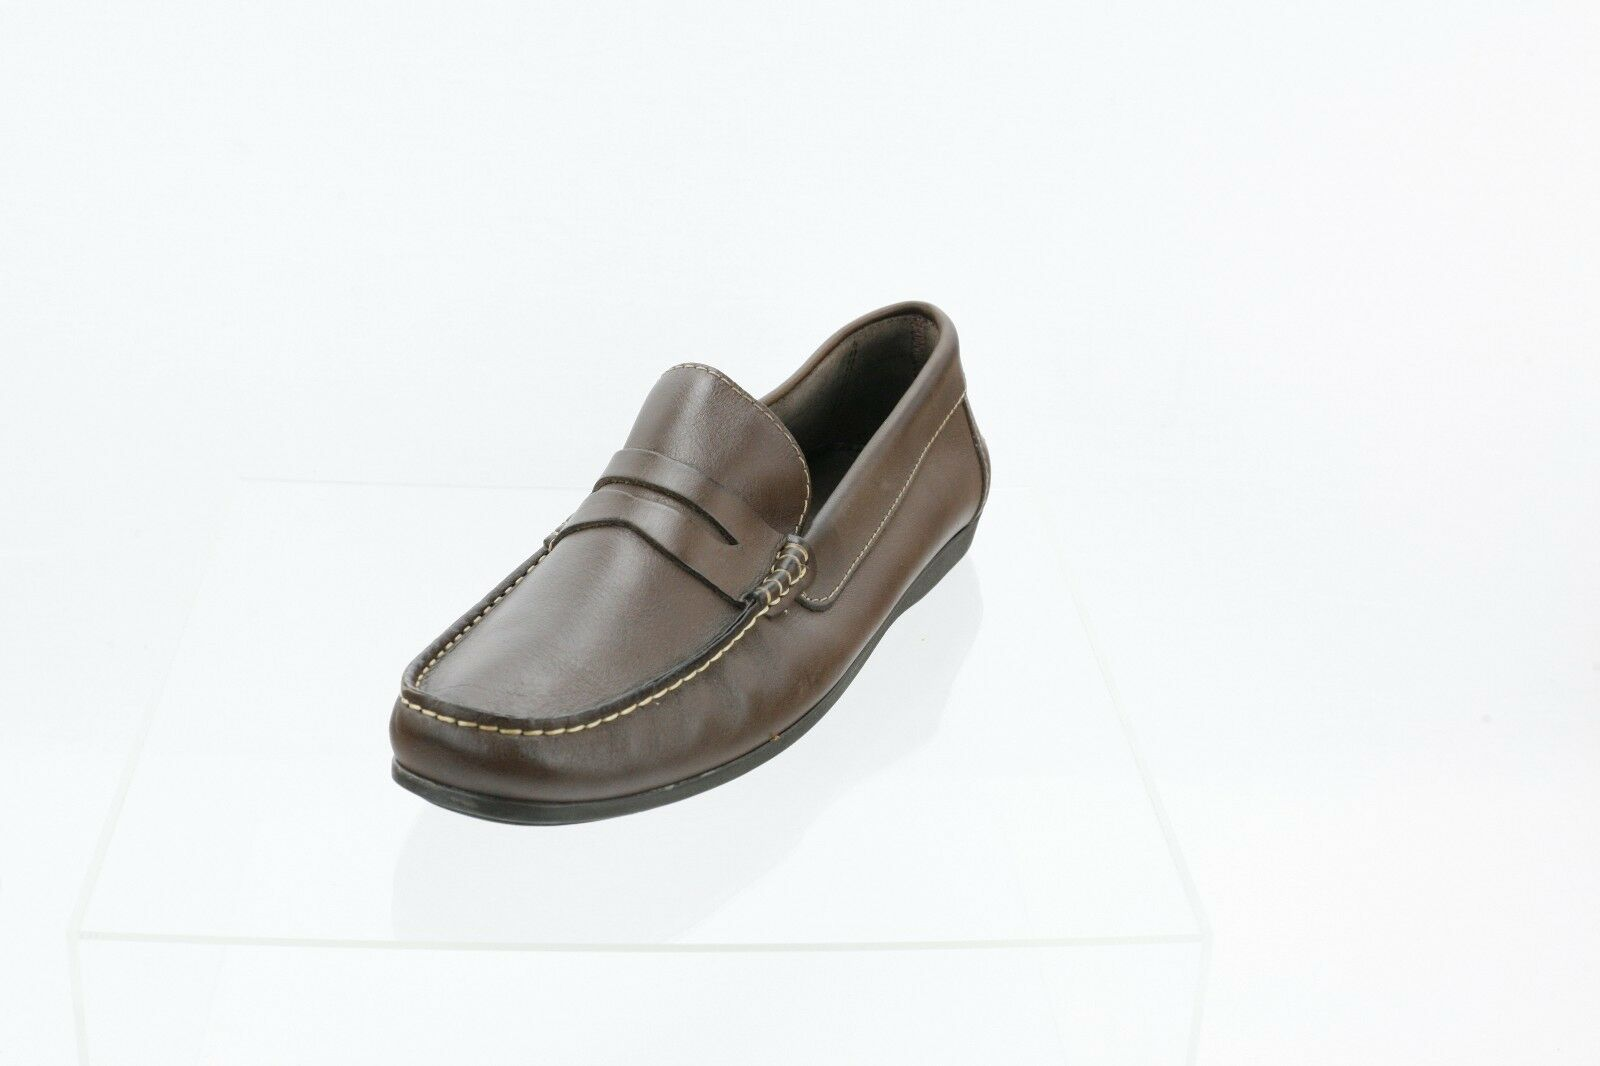 Florsheim Jasper Driving shoes Brown Leather Moc Toe Penny Loafers Men's  Sz 10